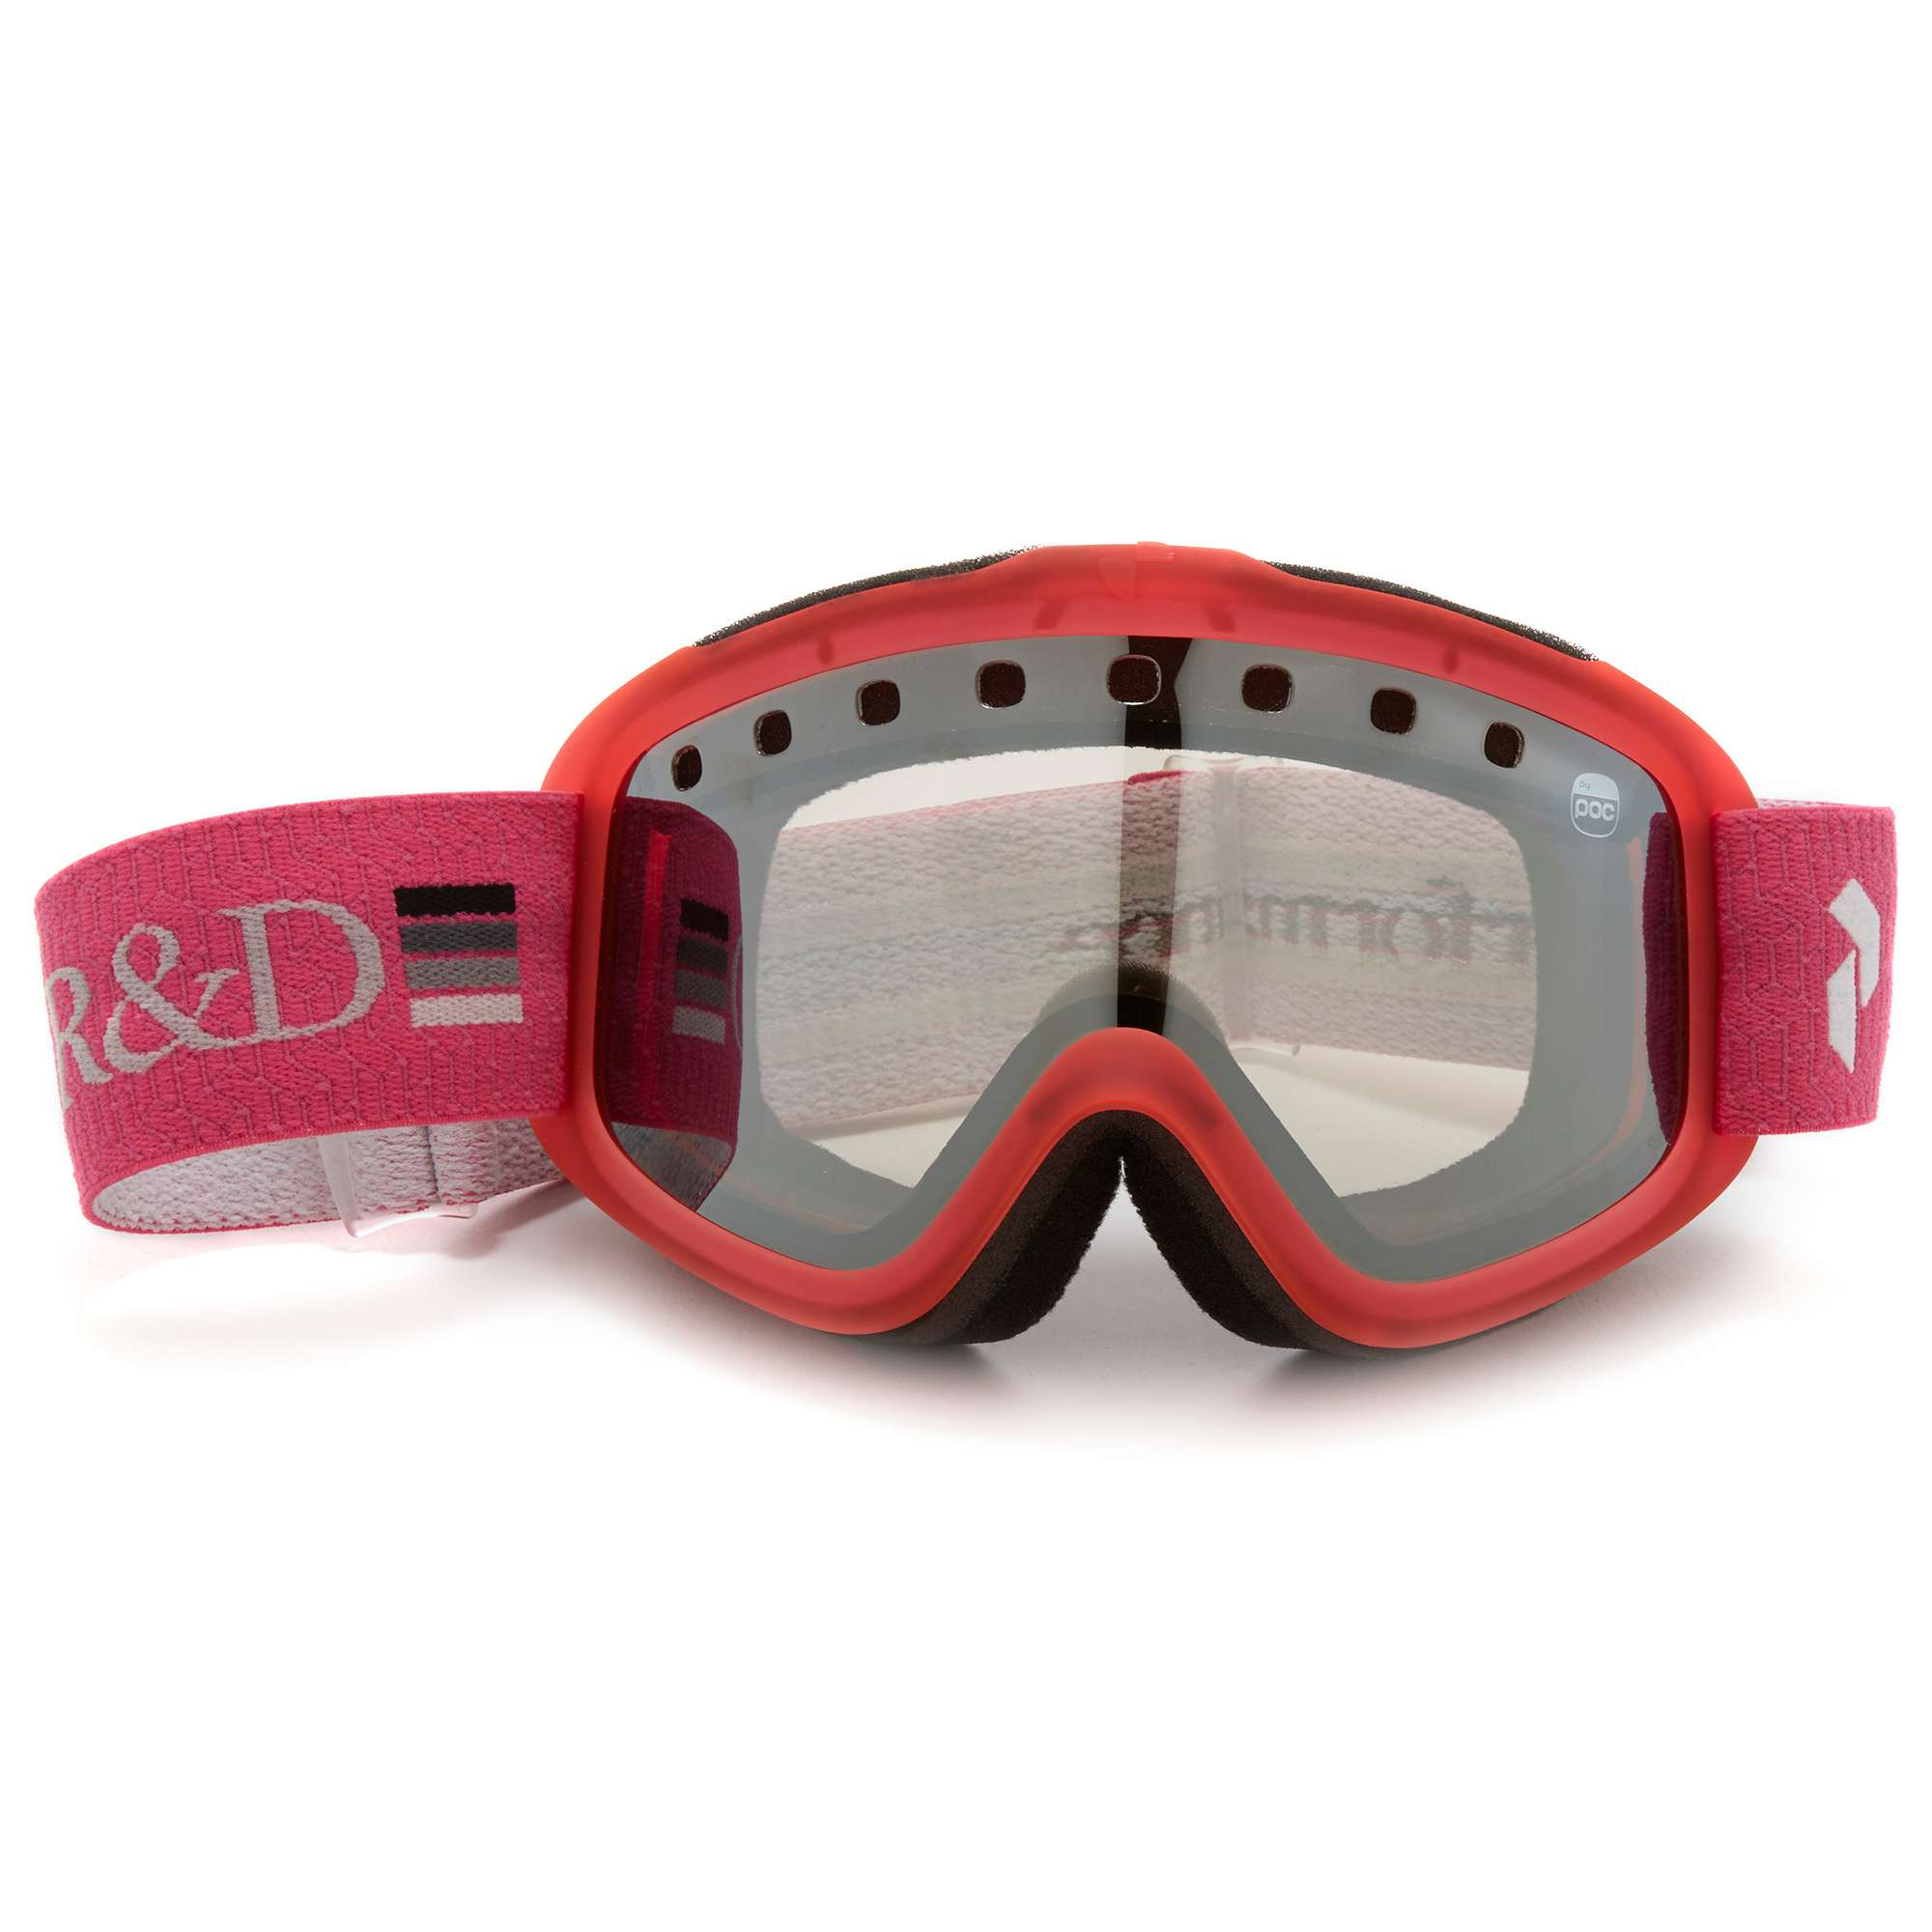 PEAK PERF Iris X Ski Goggles